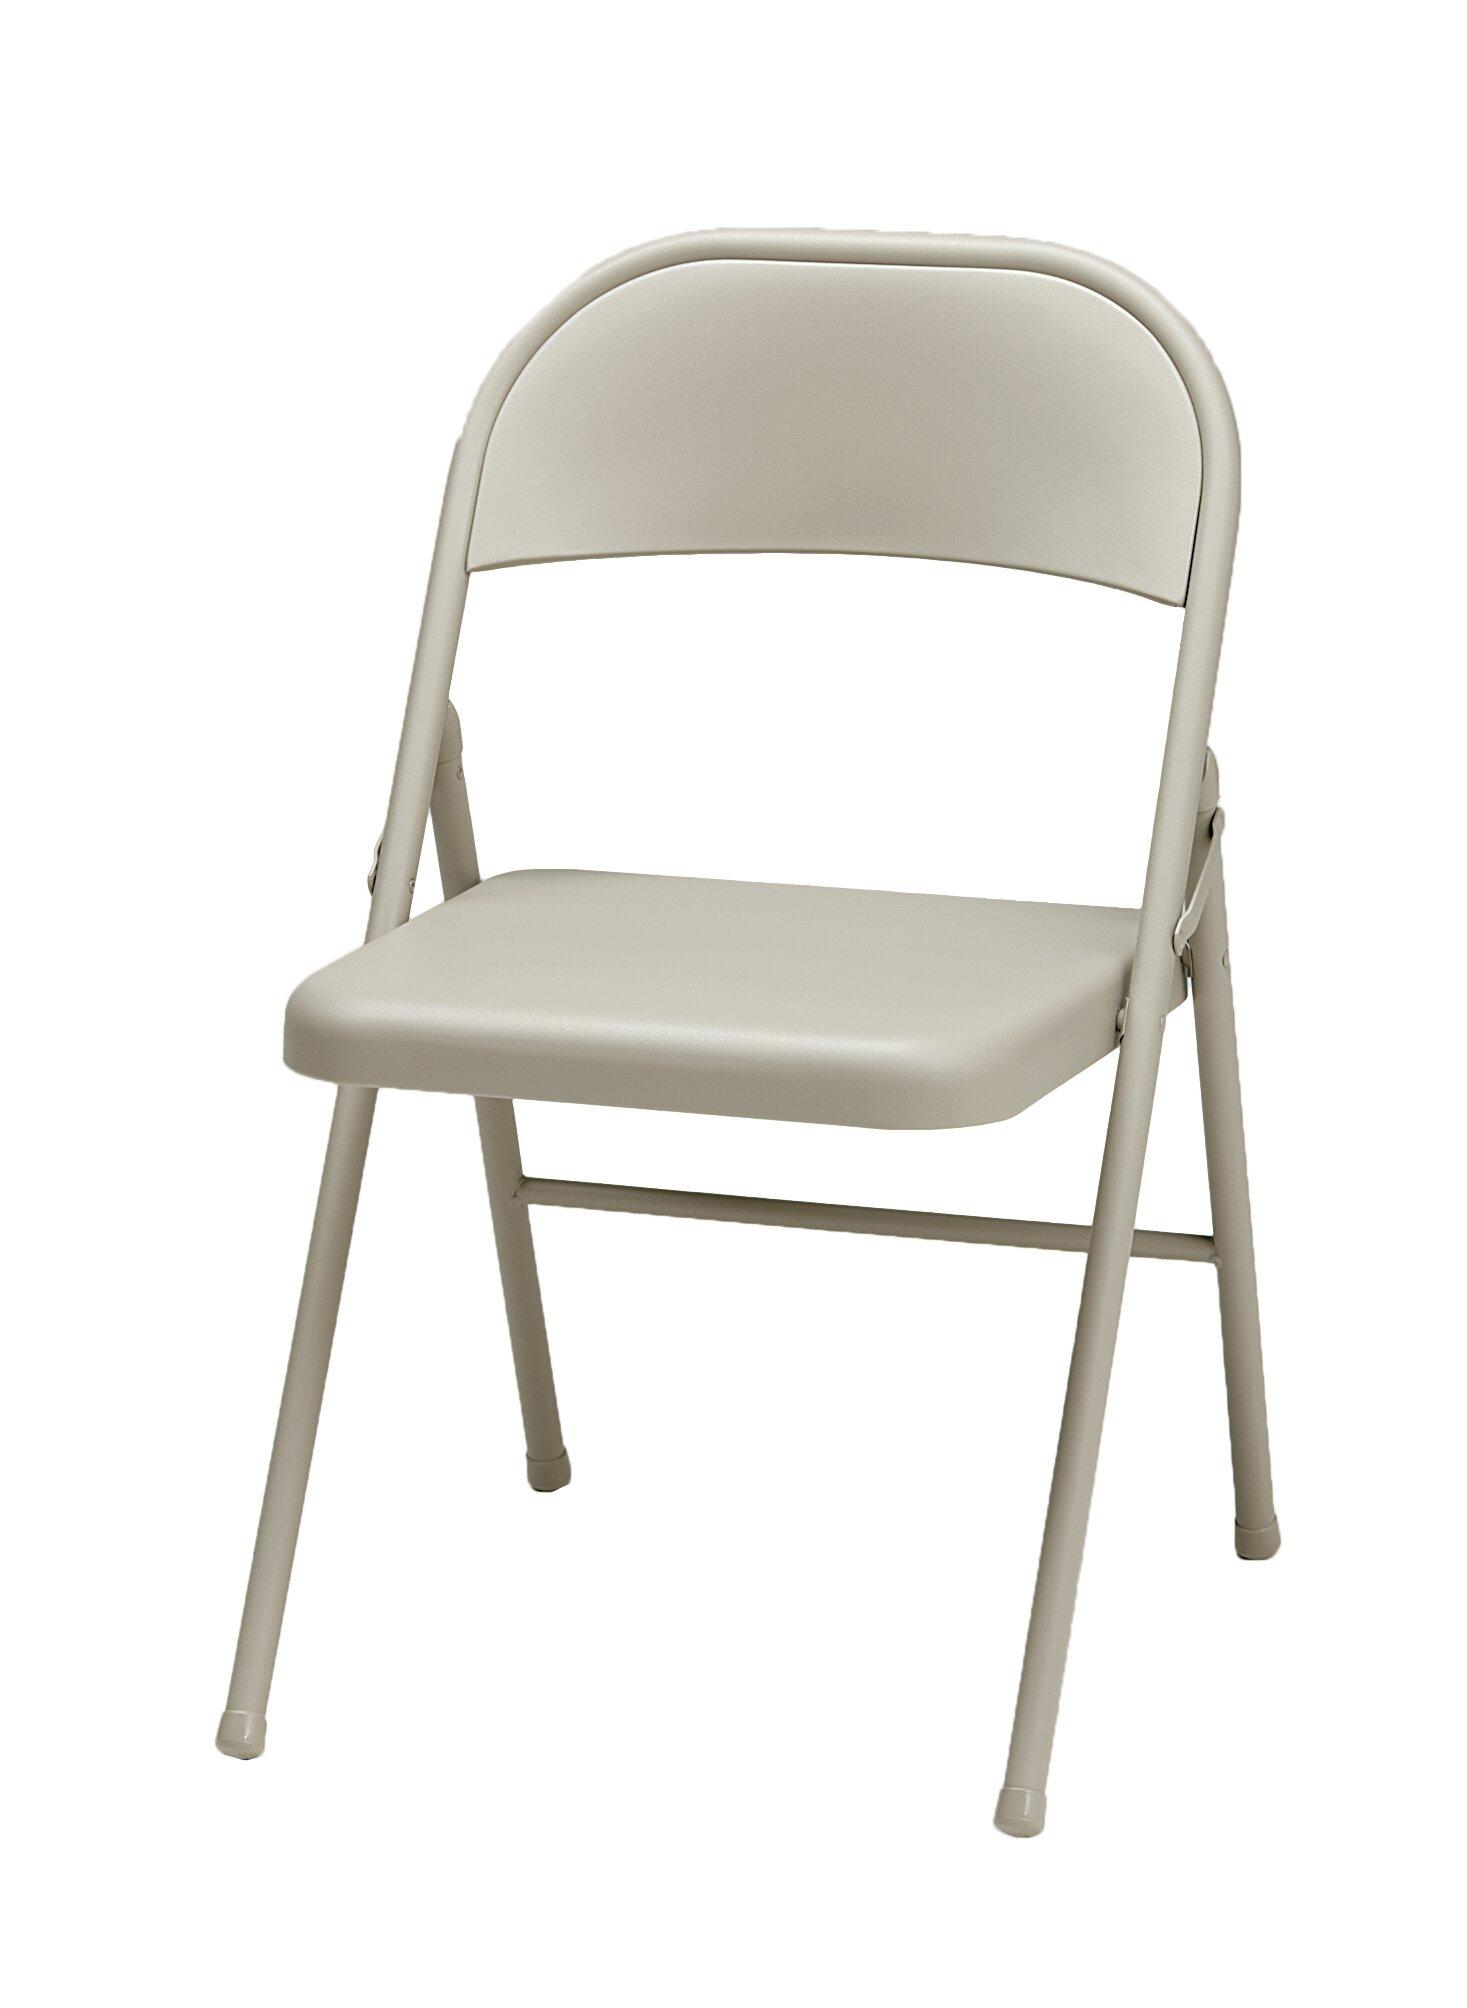 Awe Inspiring Sudden Comfort Metal Folding Chair Pabps2019 Chair Design Images Pabps2019Com